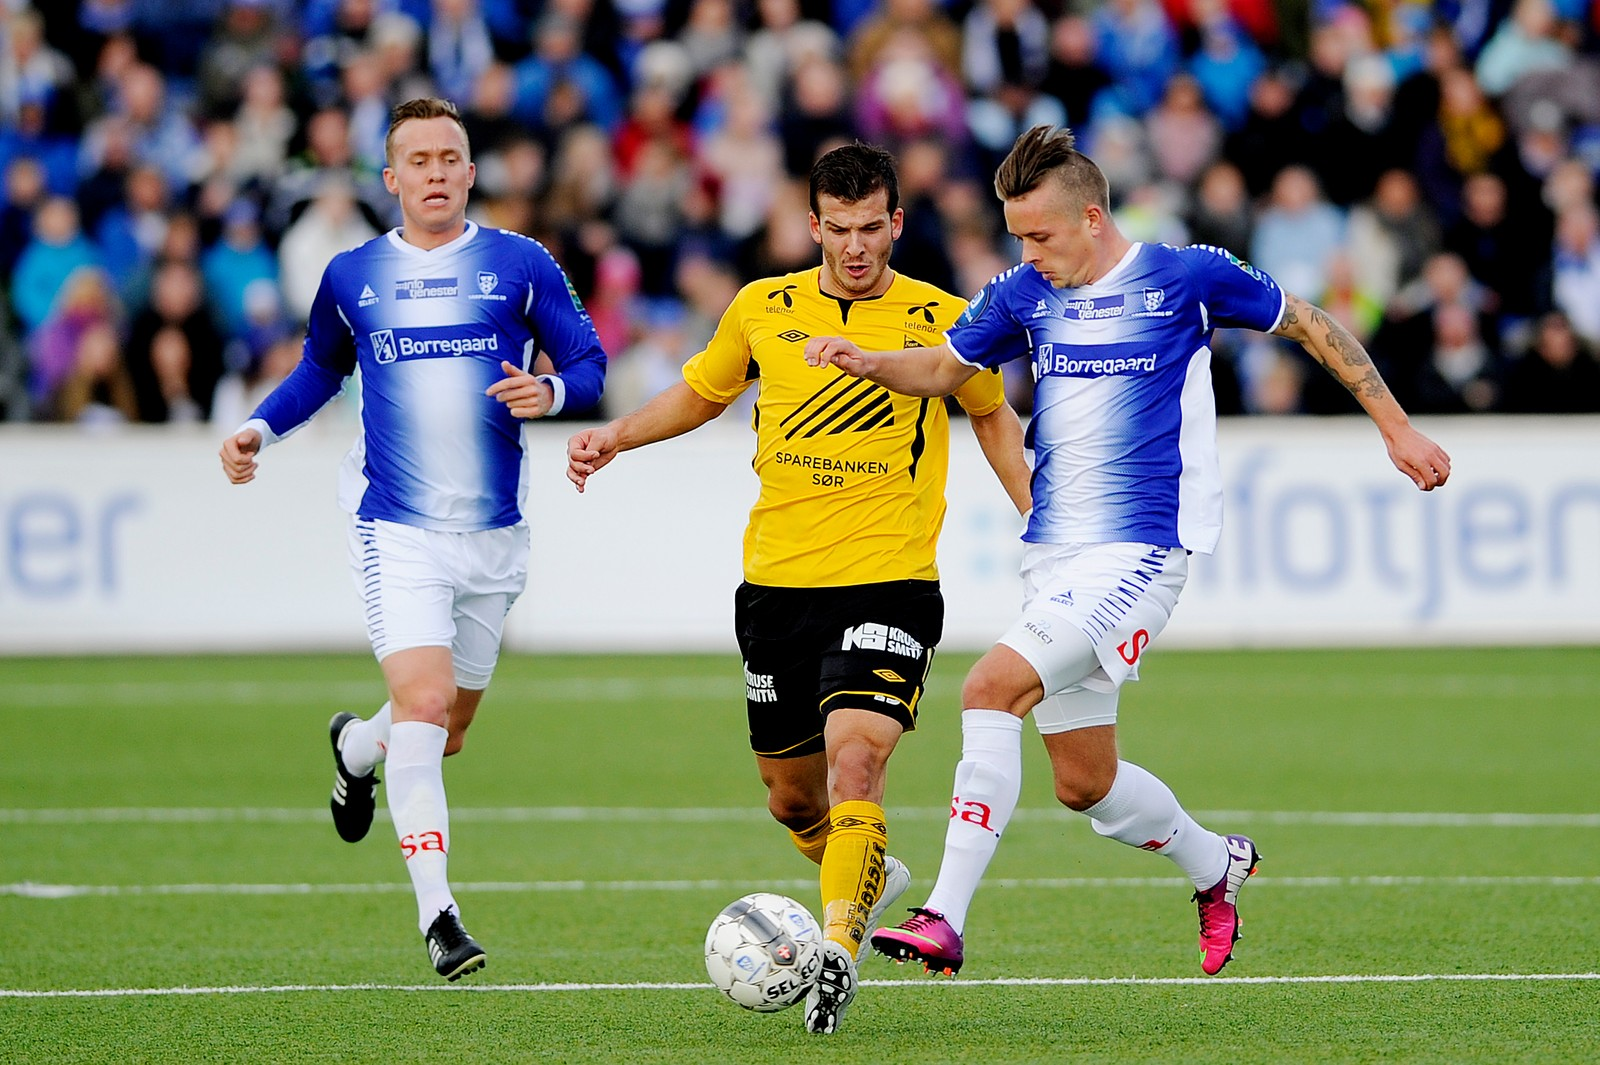 Tripic mot Sarpsborg 08. Kampen enda 1-1 i Sarpsborg.